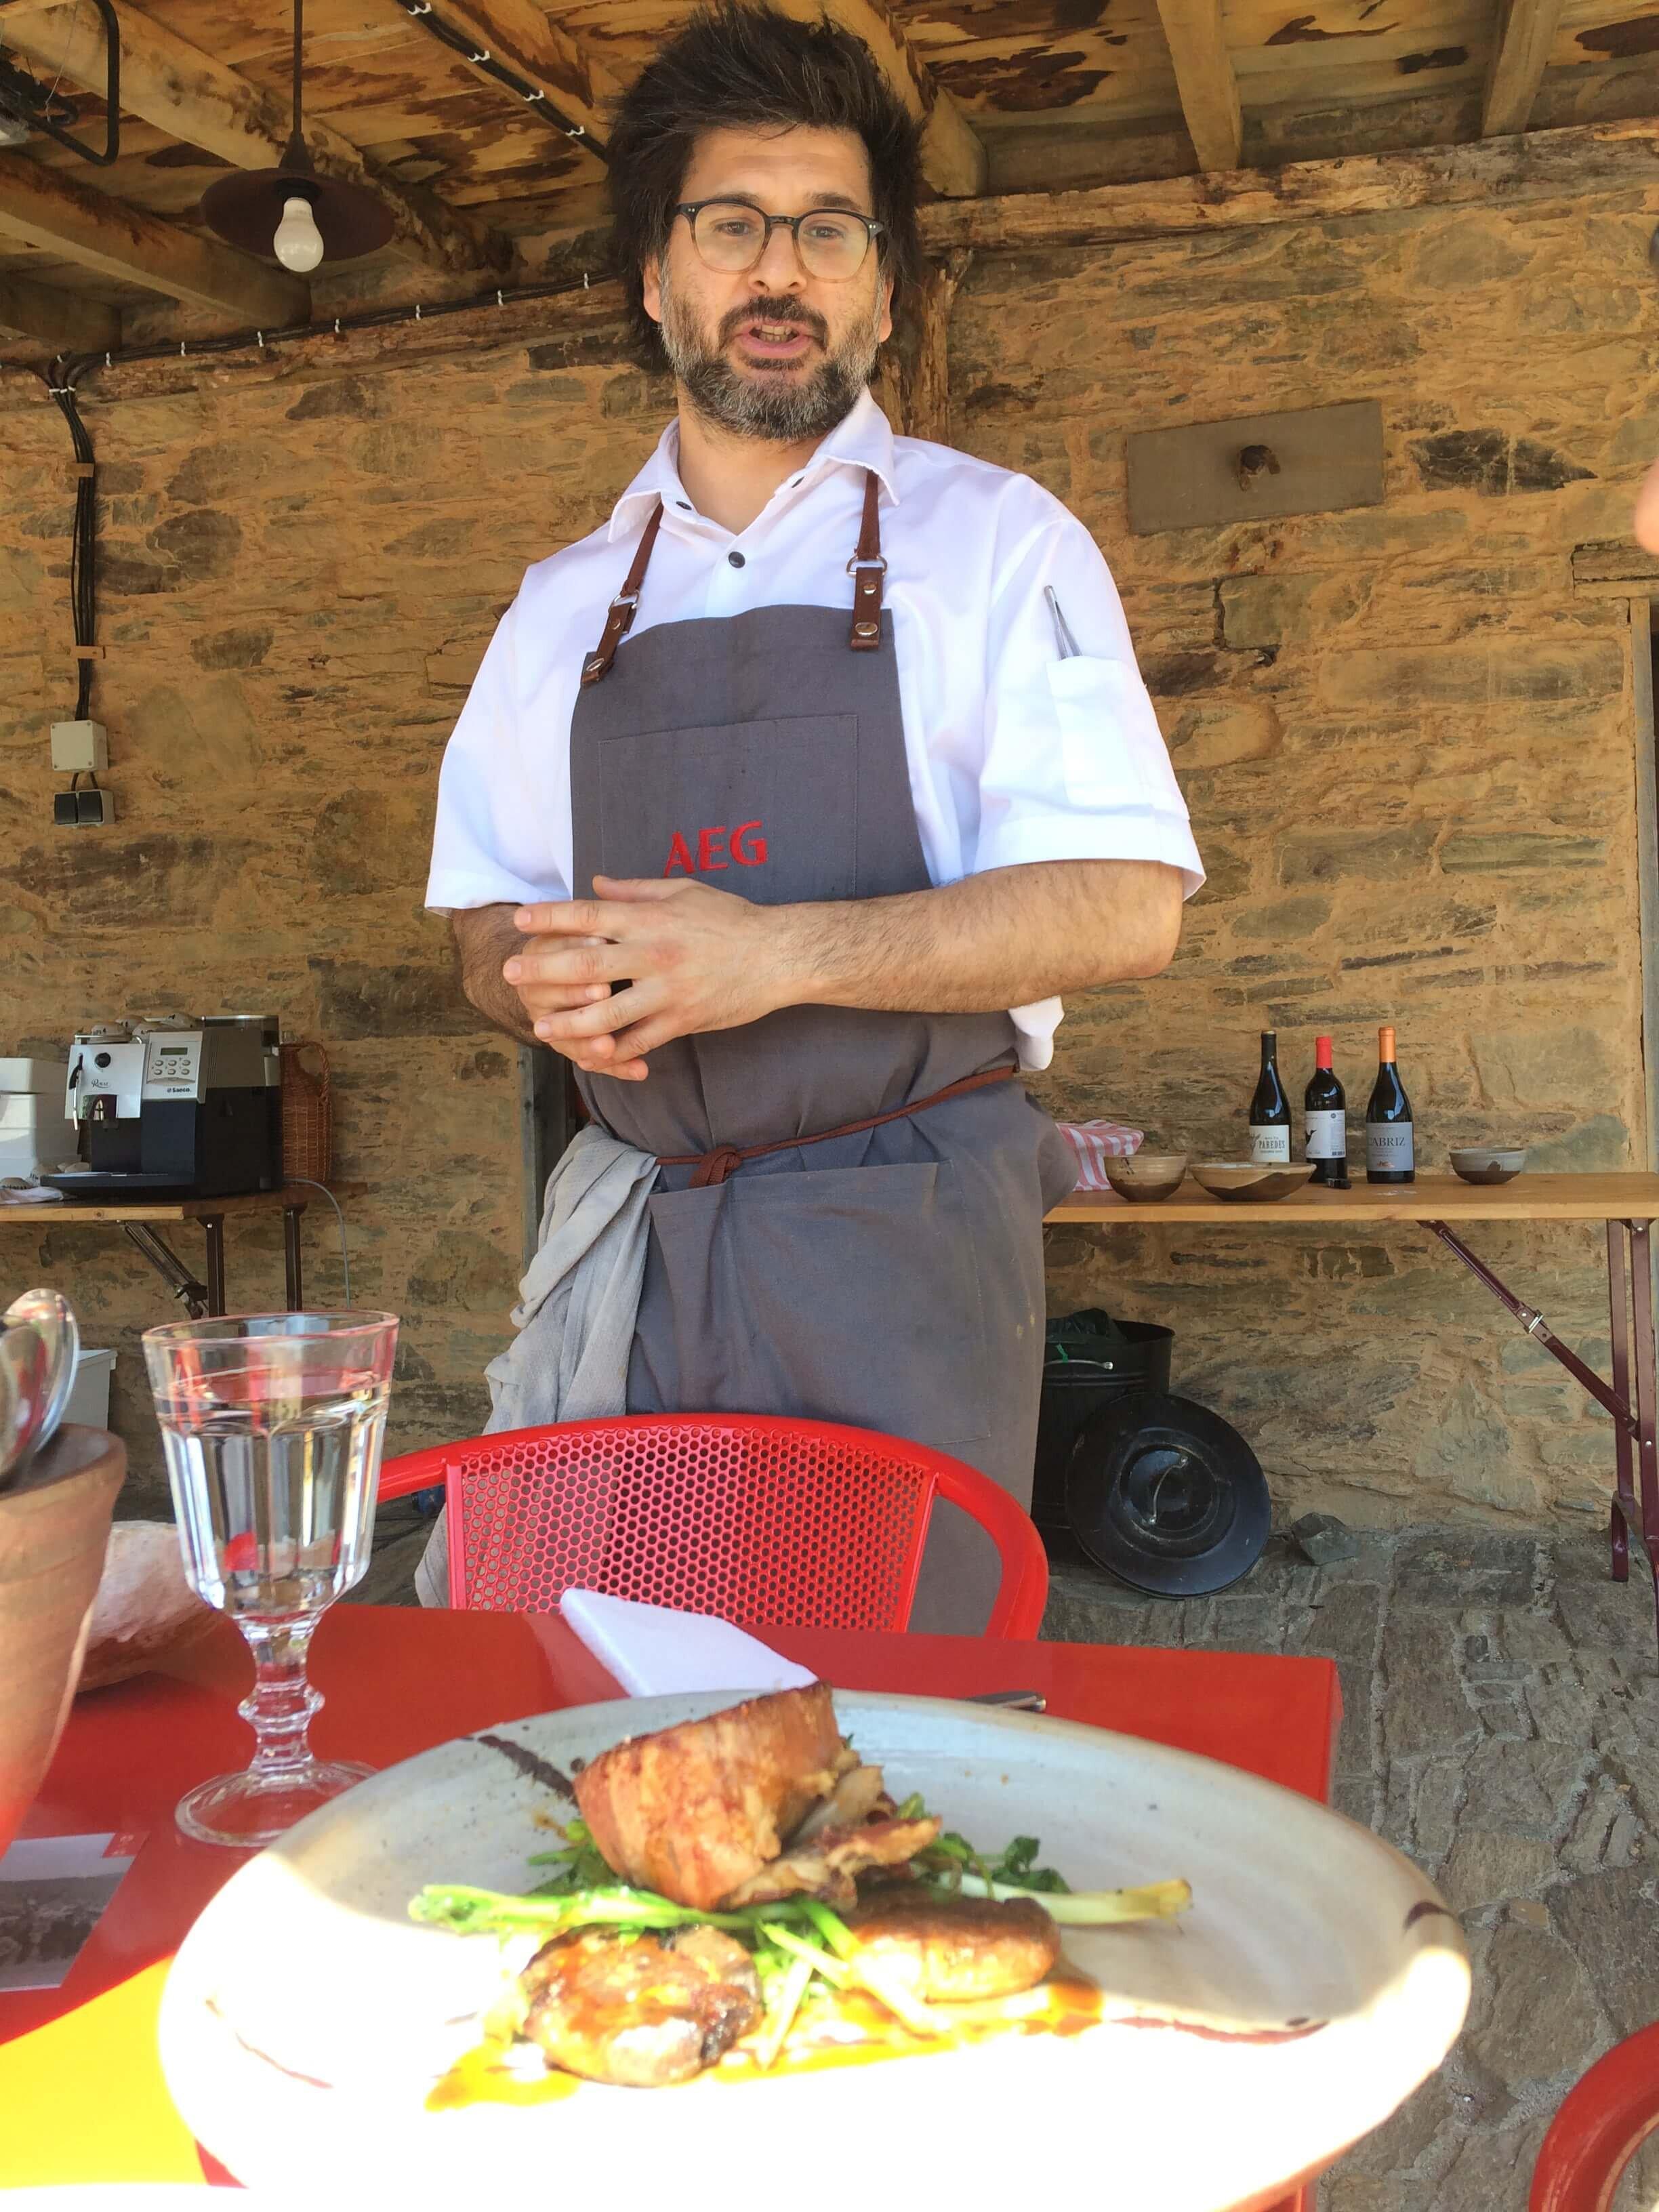 de-mestres-e-chefs-festival-gastronomico-lousa-cabrito13.JPG